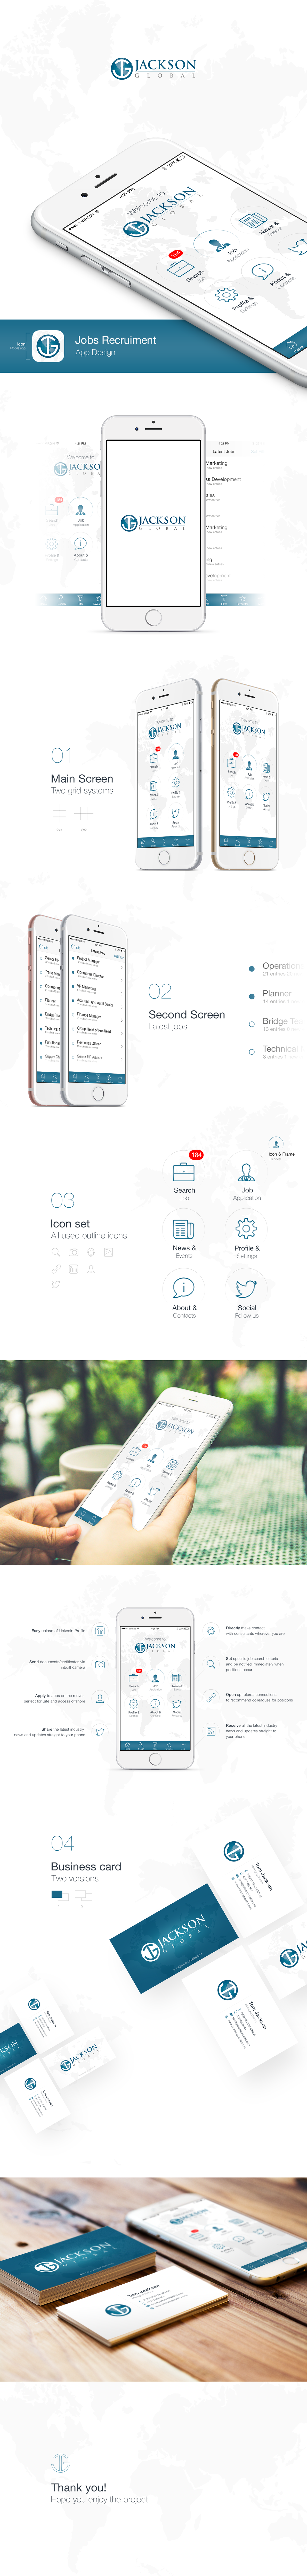 Mobile app ios theme energy sector job iphone 6 app mobile design app